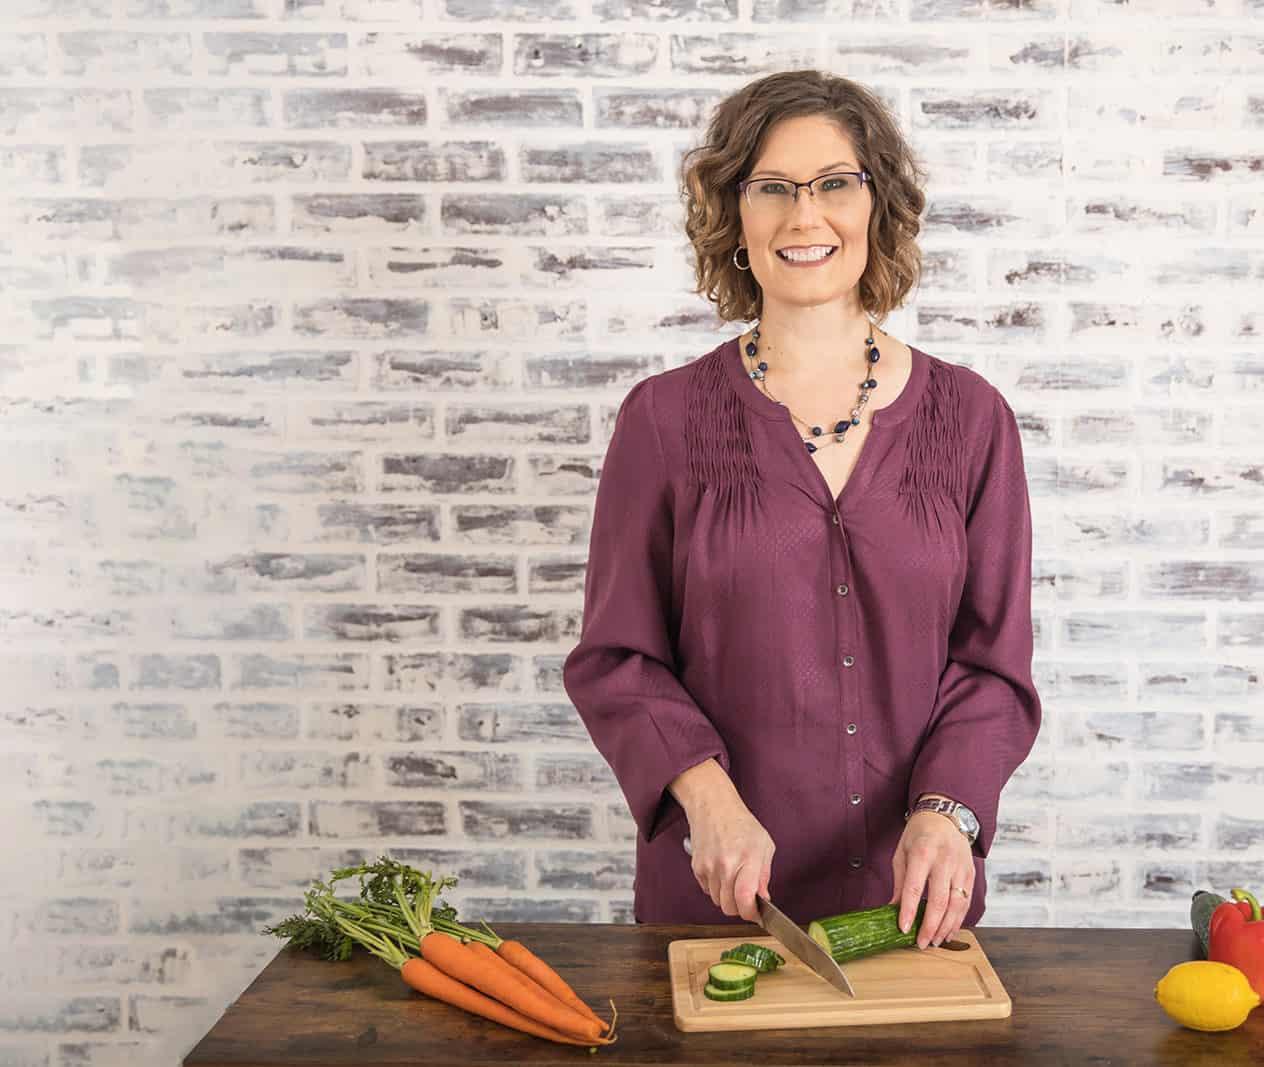 Marianne Gernetzke cutting vegetables photo